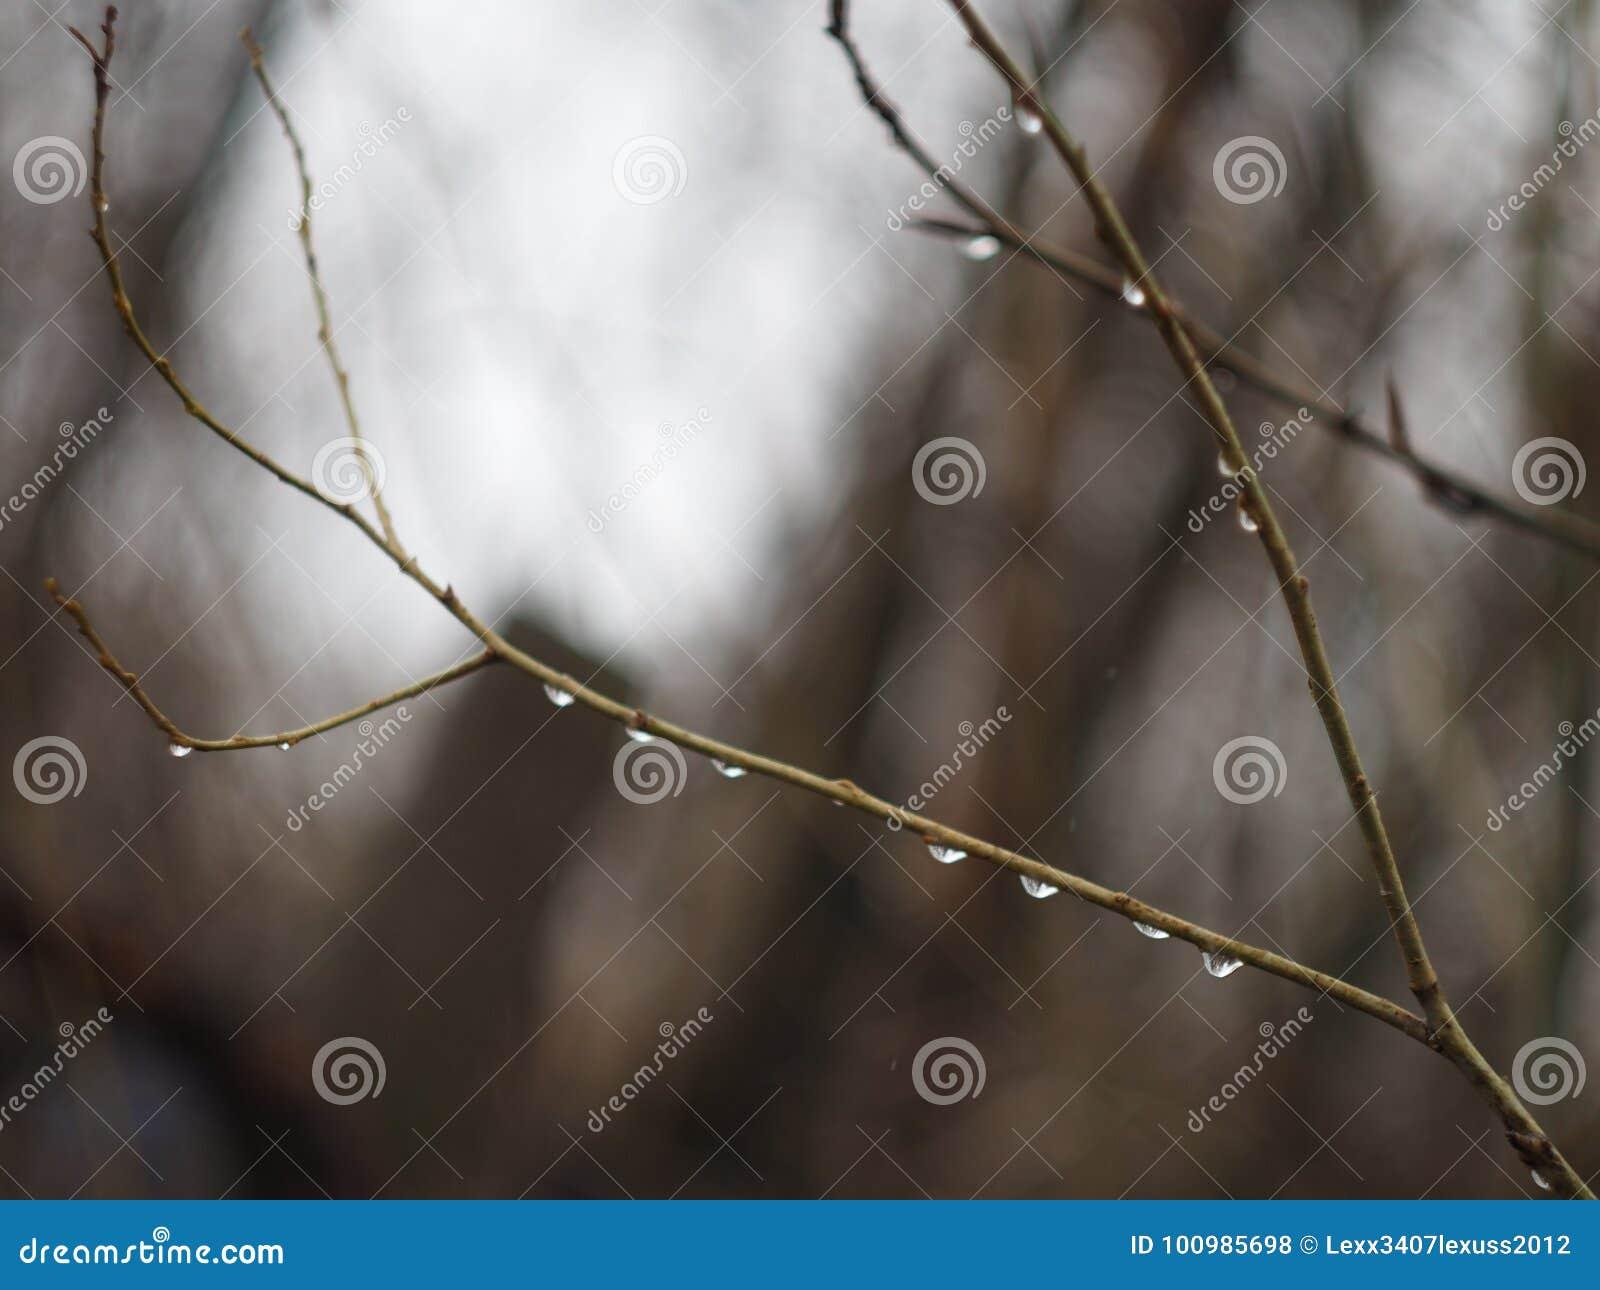 Aspen branches.